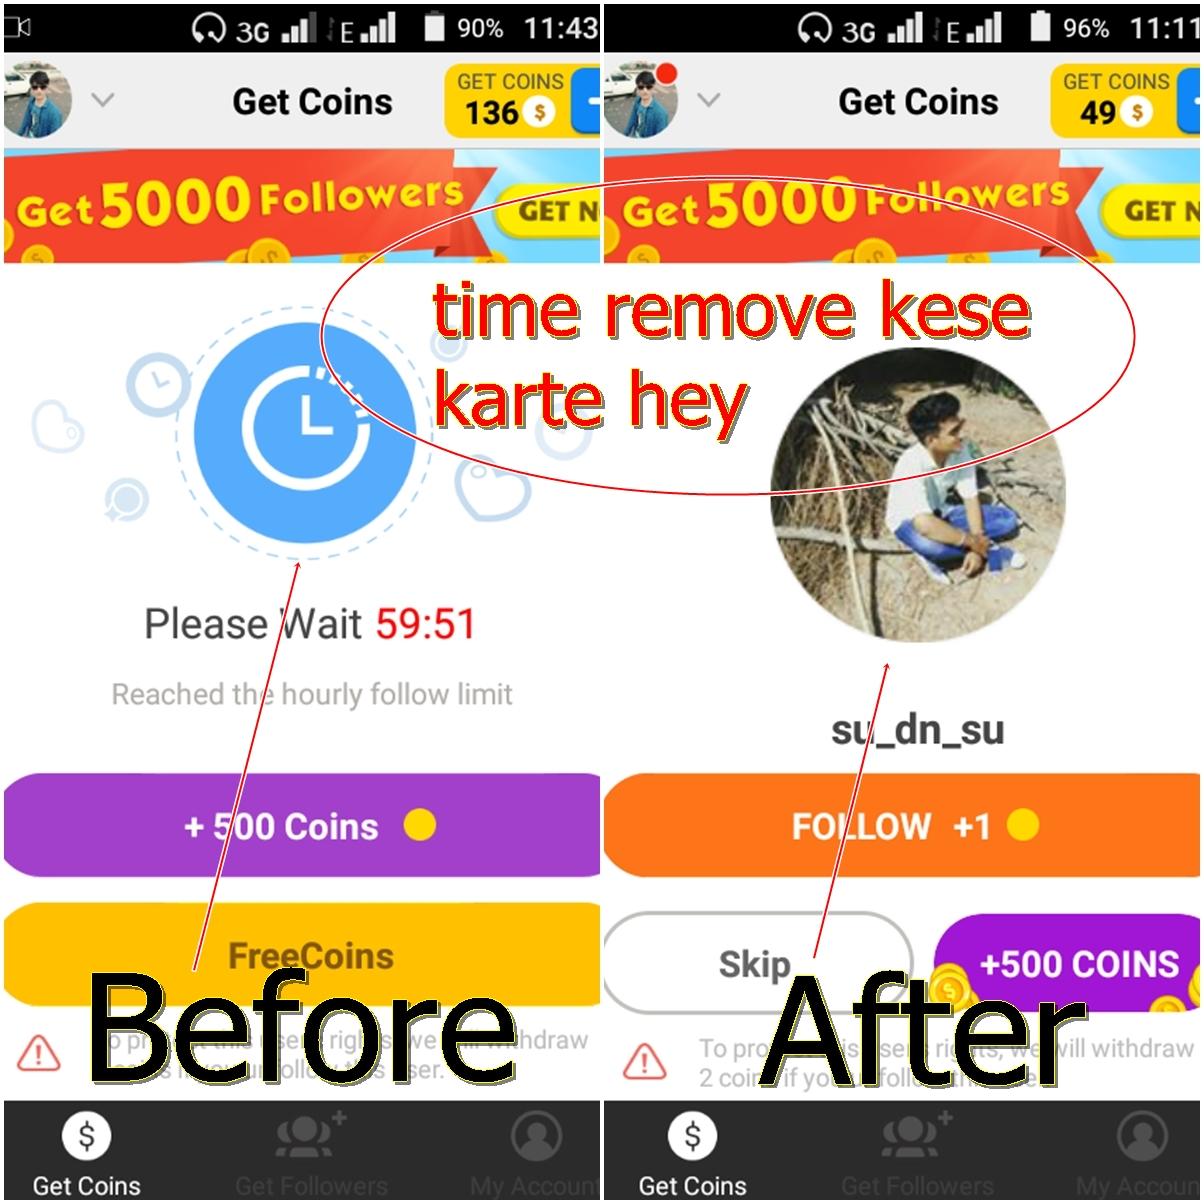 How to get followere andoriad app 60 minitue time hack 2017 tricks